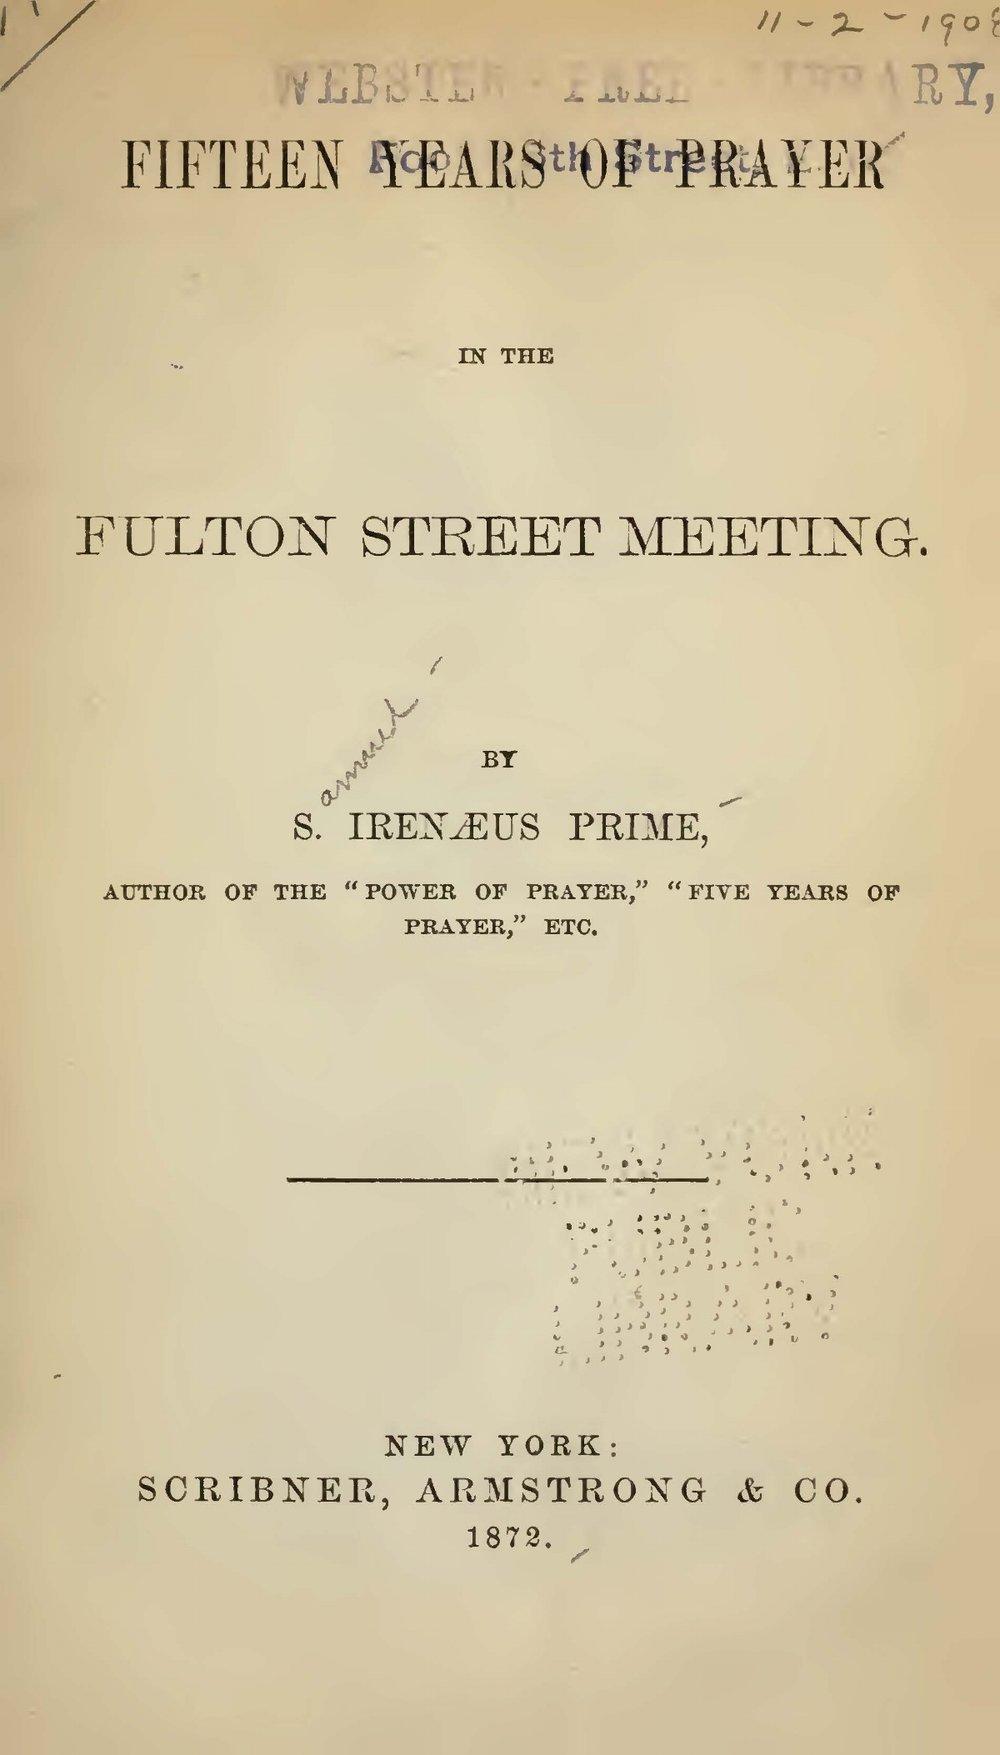 Prime, Samuel Irenaeus, Fifteen Years of Prayer in the Fulton Street Meeting Title Page.jpg